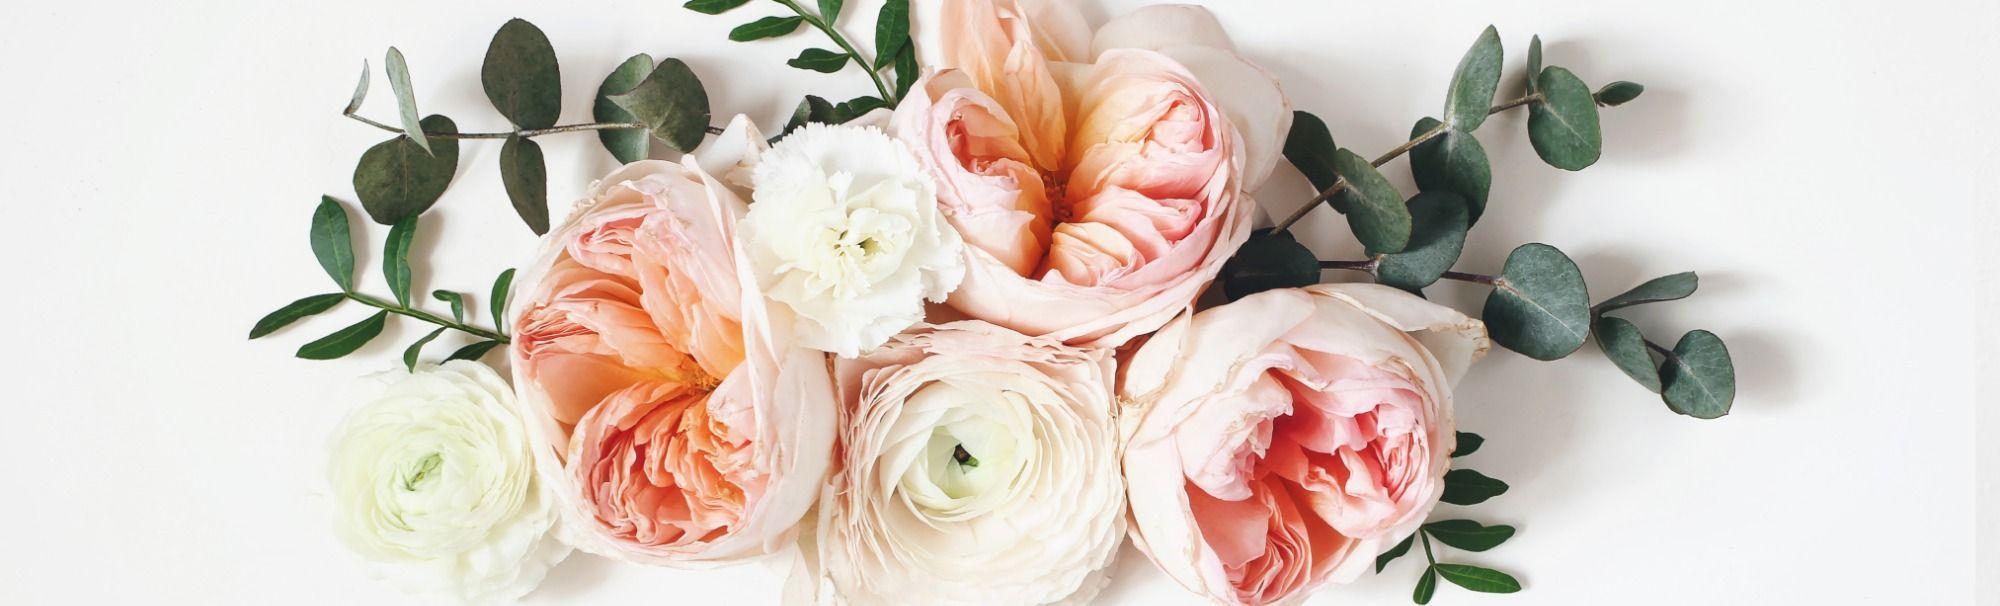 San Antonio Florist Creative Floral Designs By Helene Local Flower Delivery San Antonio Tx 78209